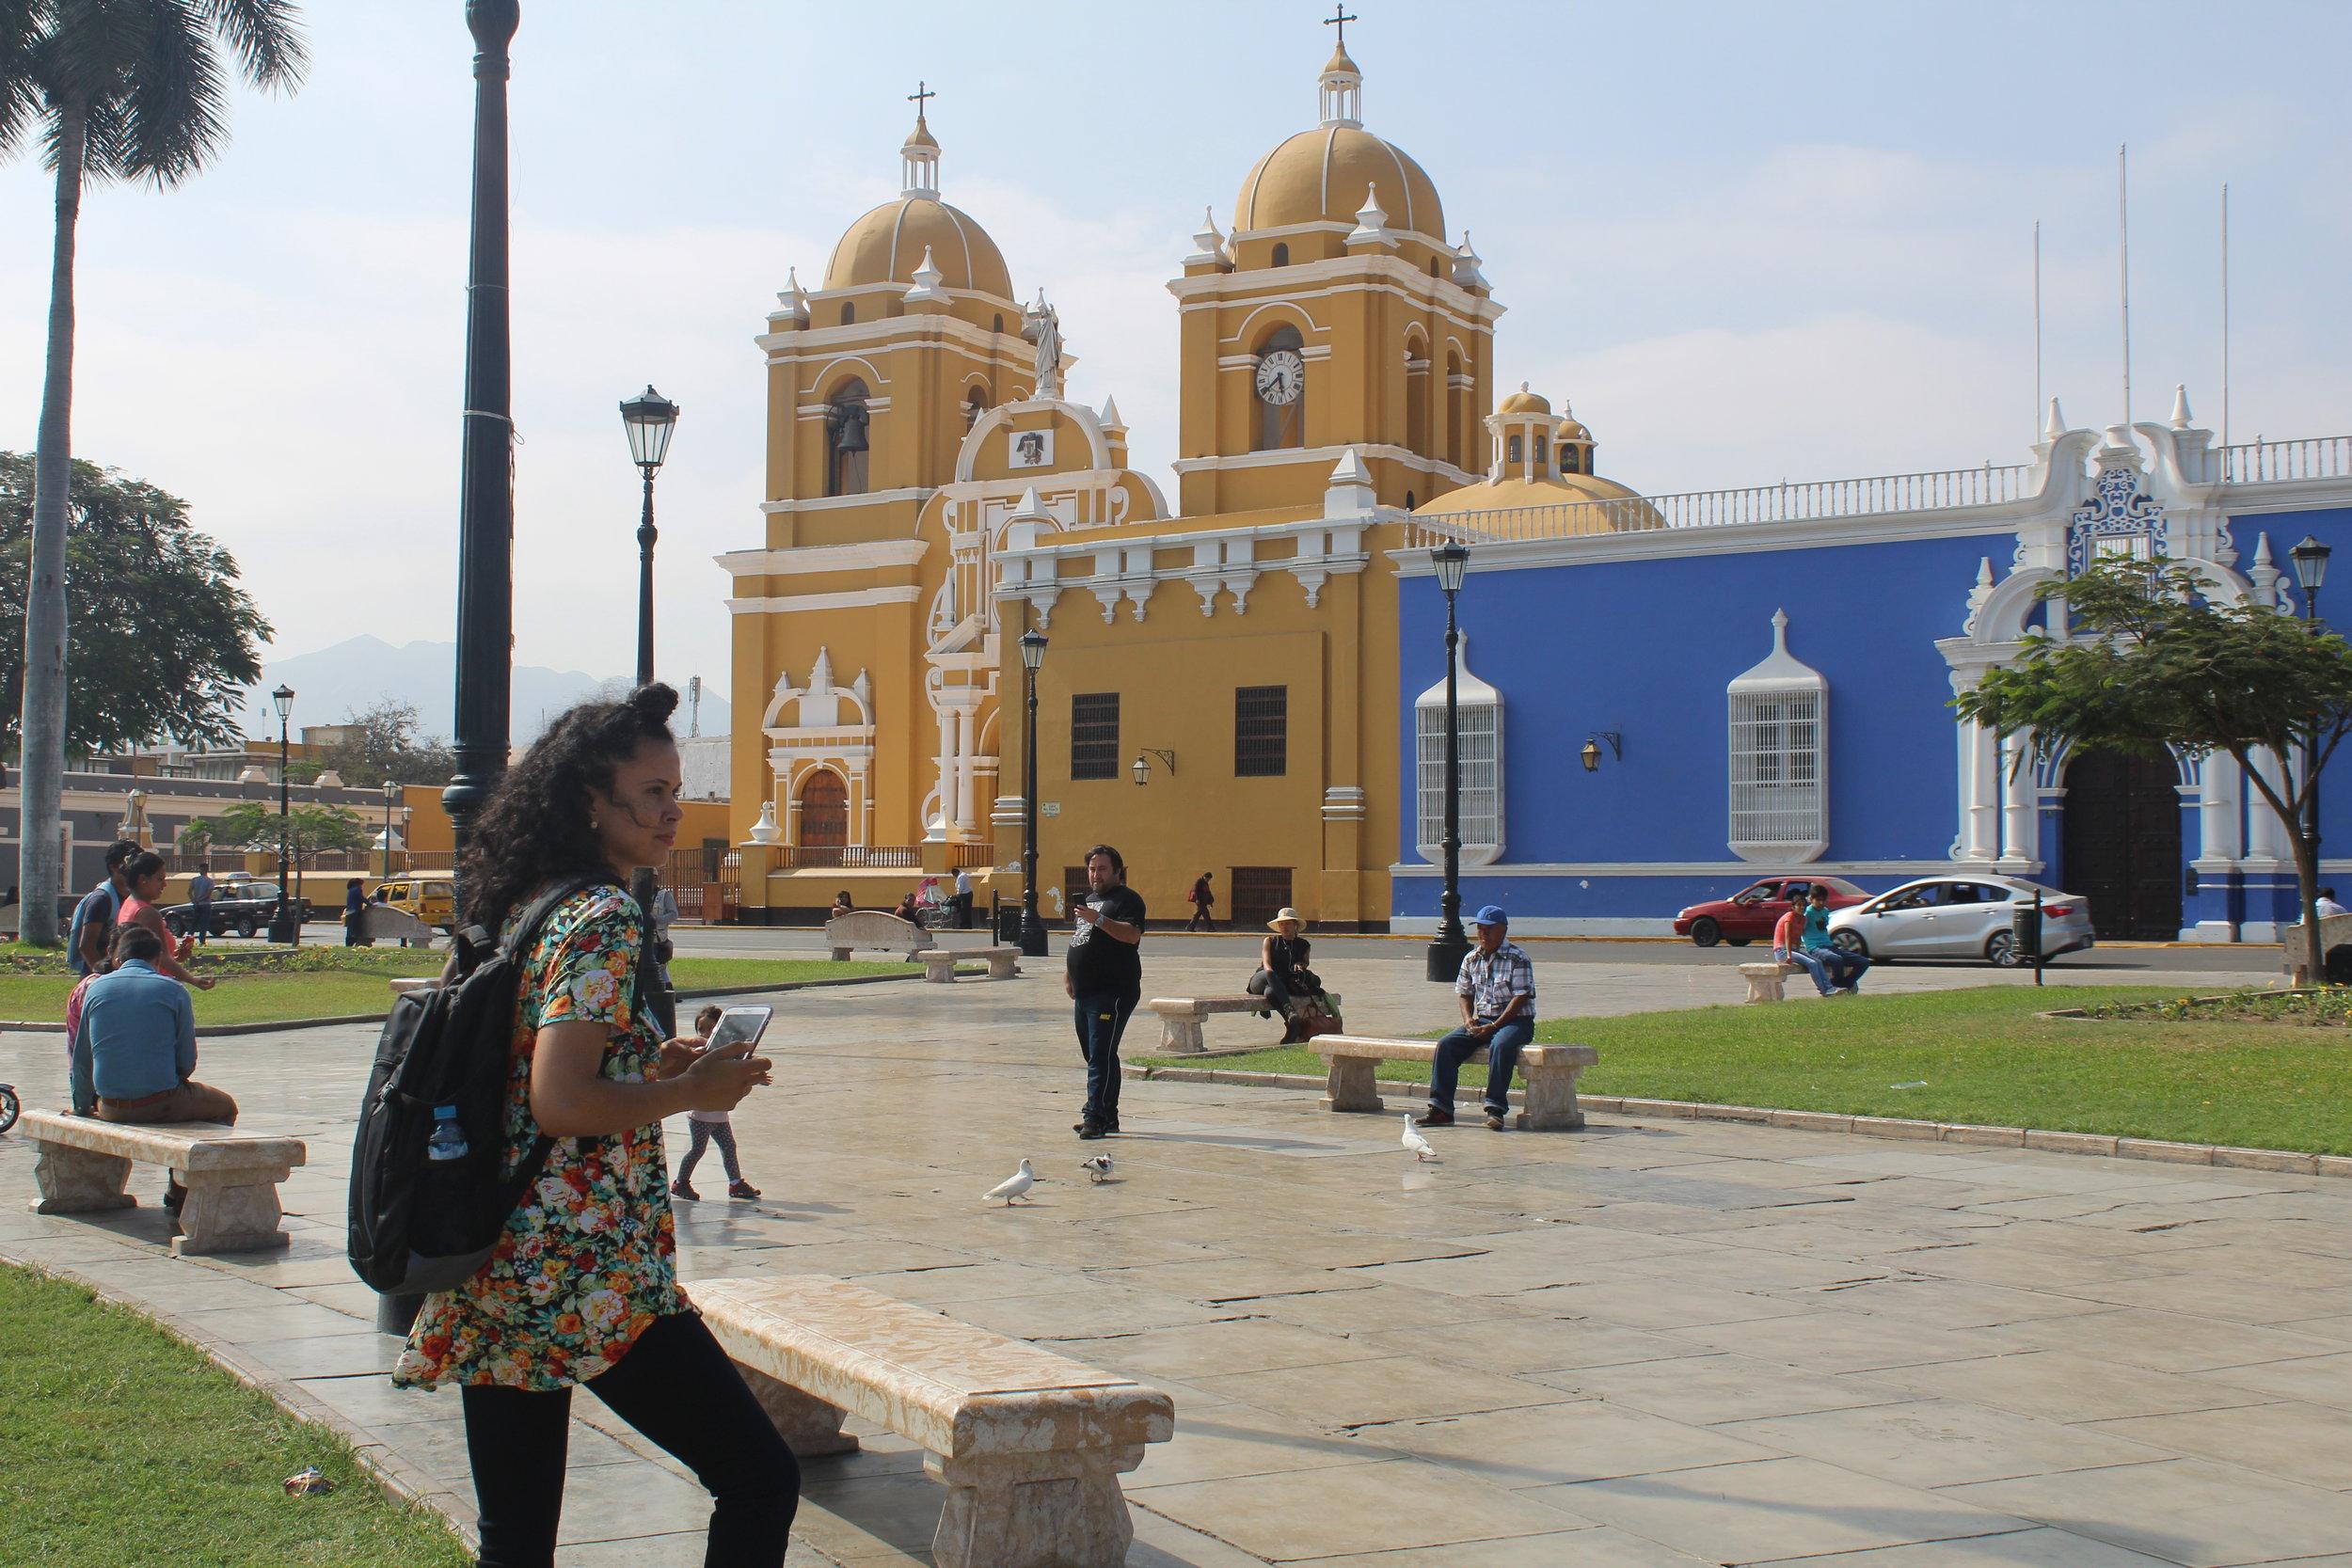 Sasha Mills in la plaza de armas of Trujillo, Peru